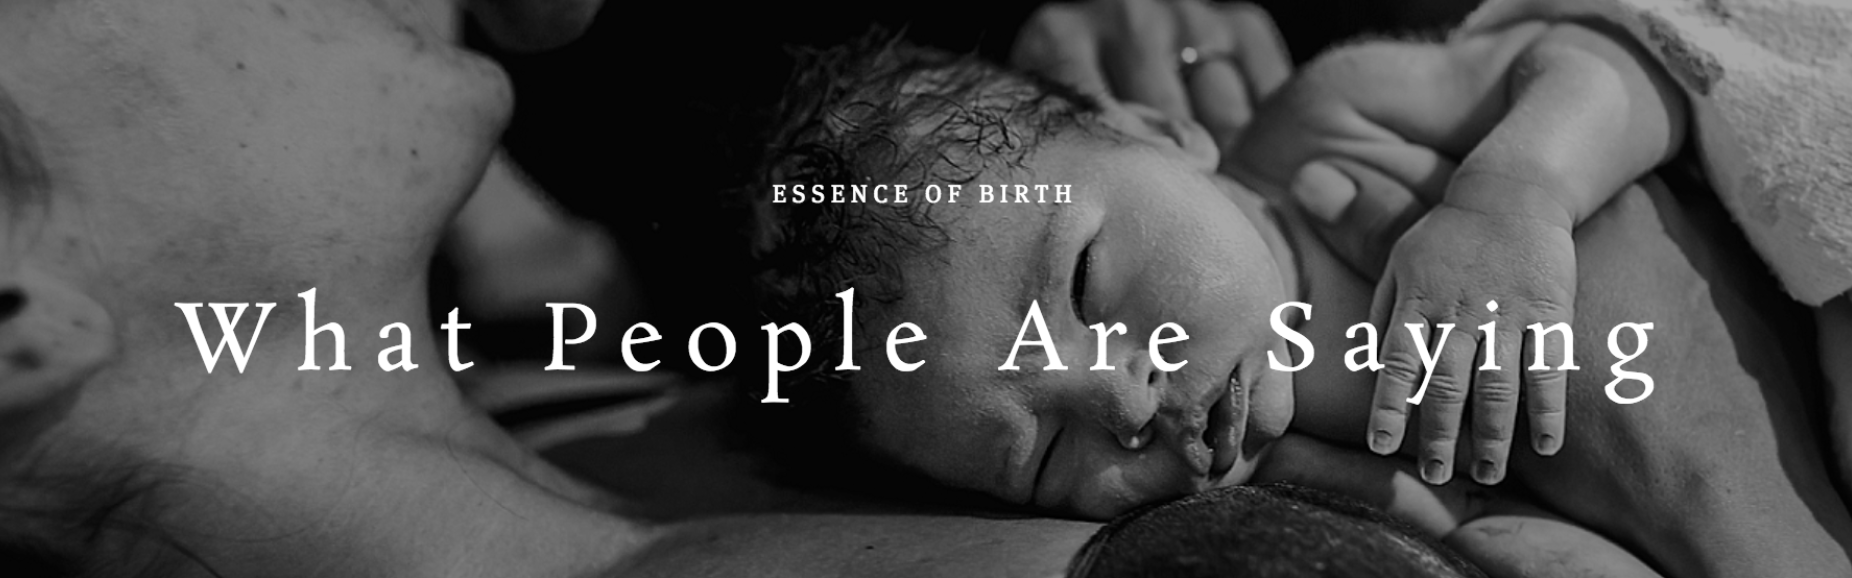 online birth photography course testimonials